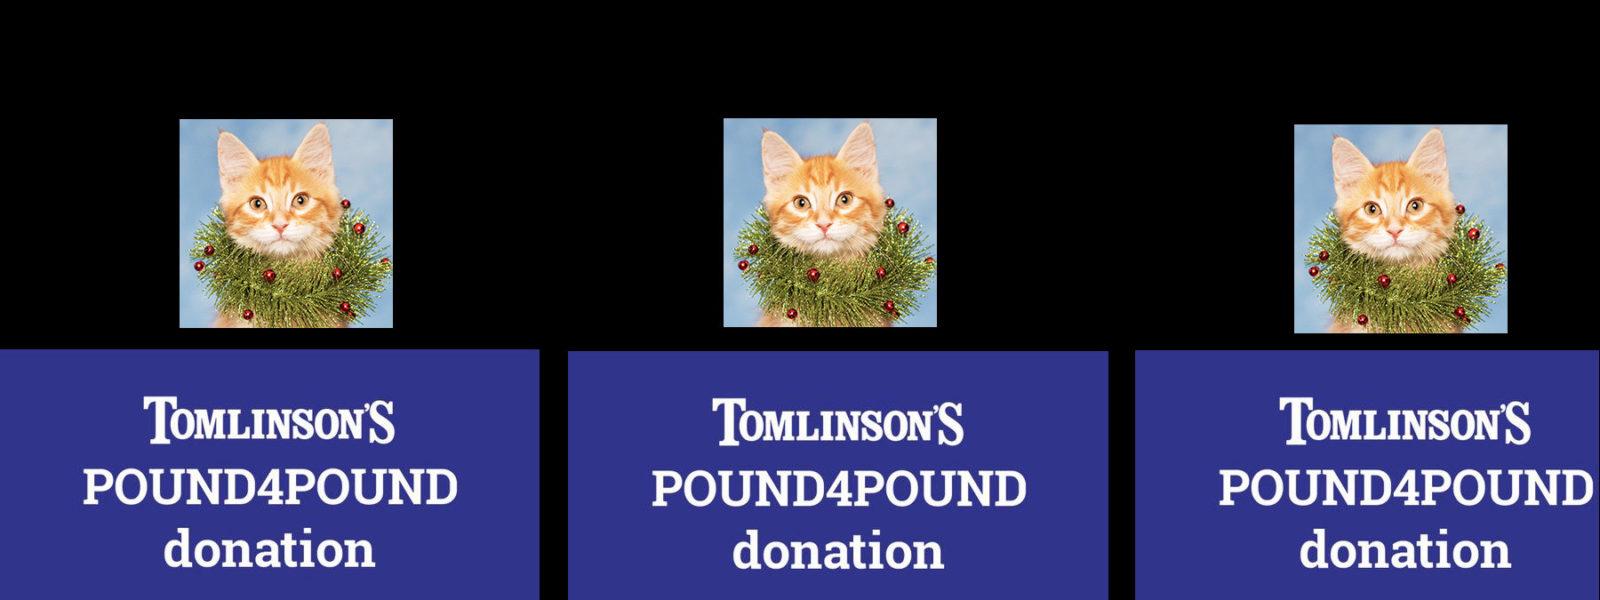 Pound 4 Pound food drive, November 20 to December 23